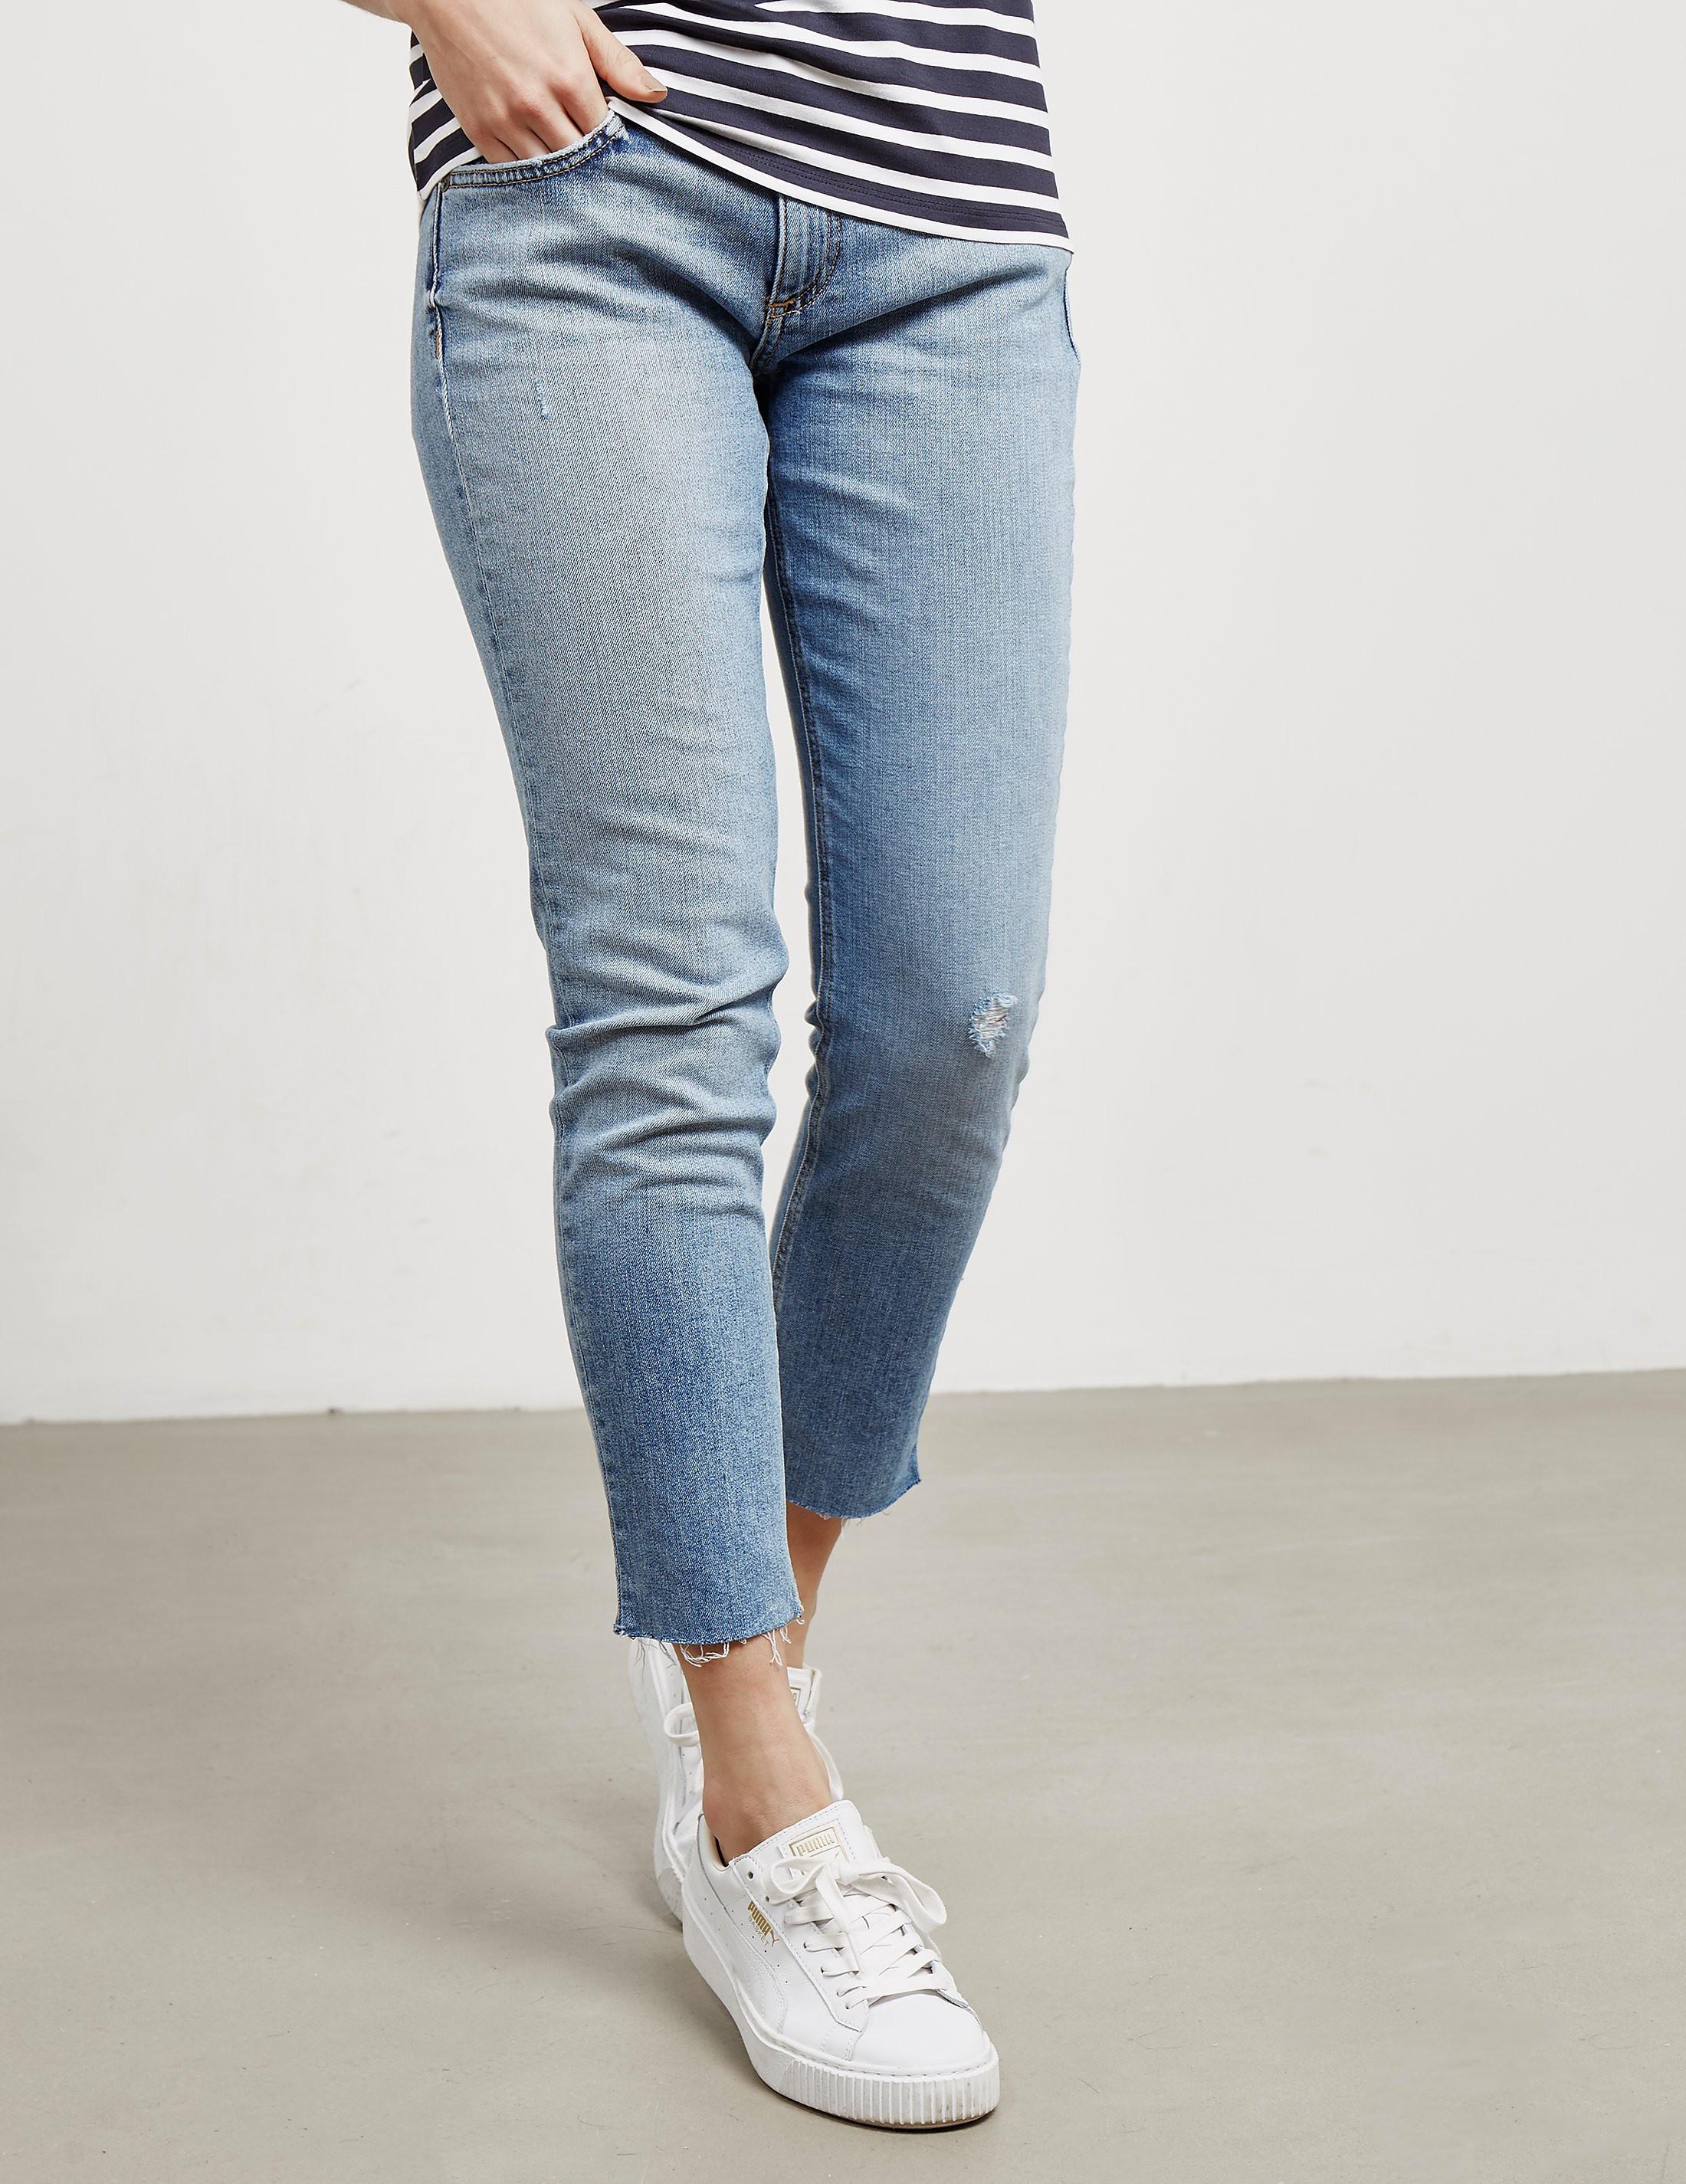 Rag & Bone Ankle Grazer Jeans